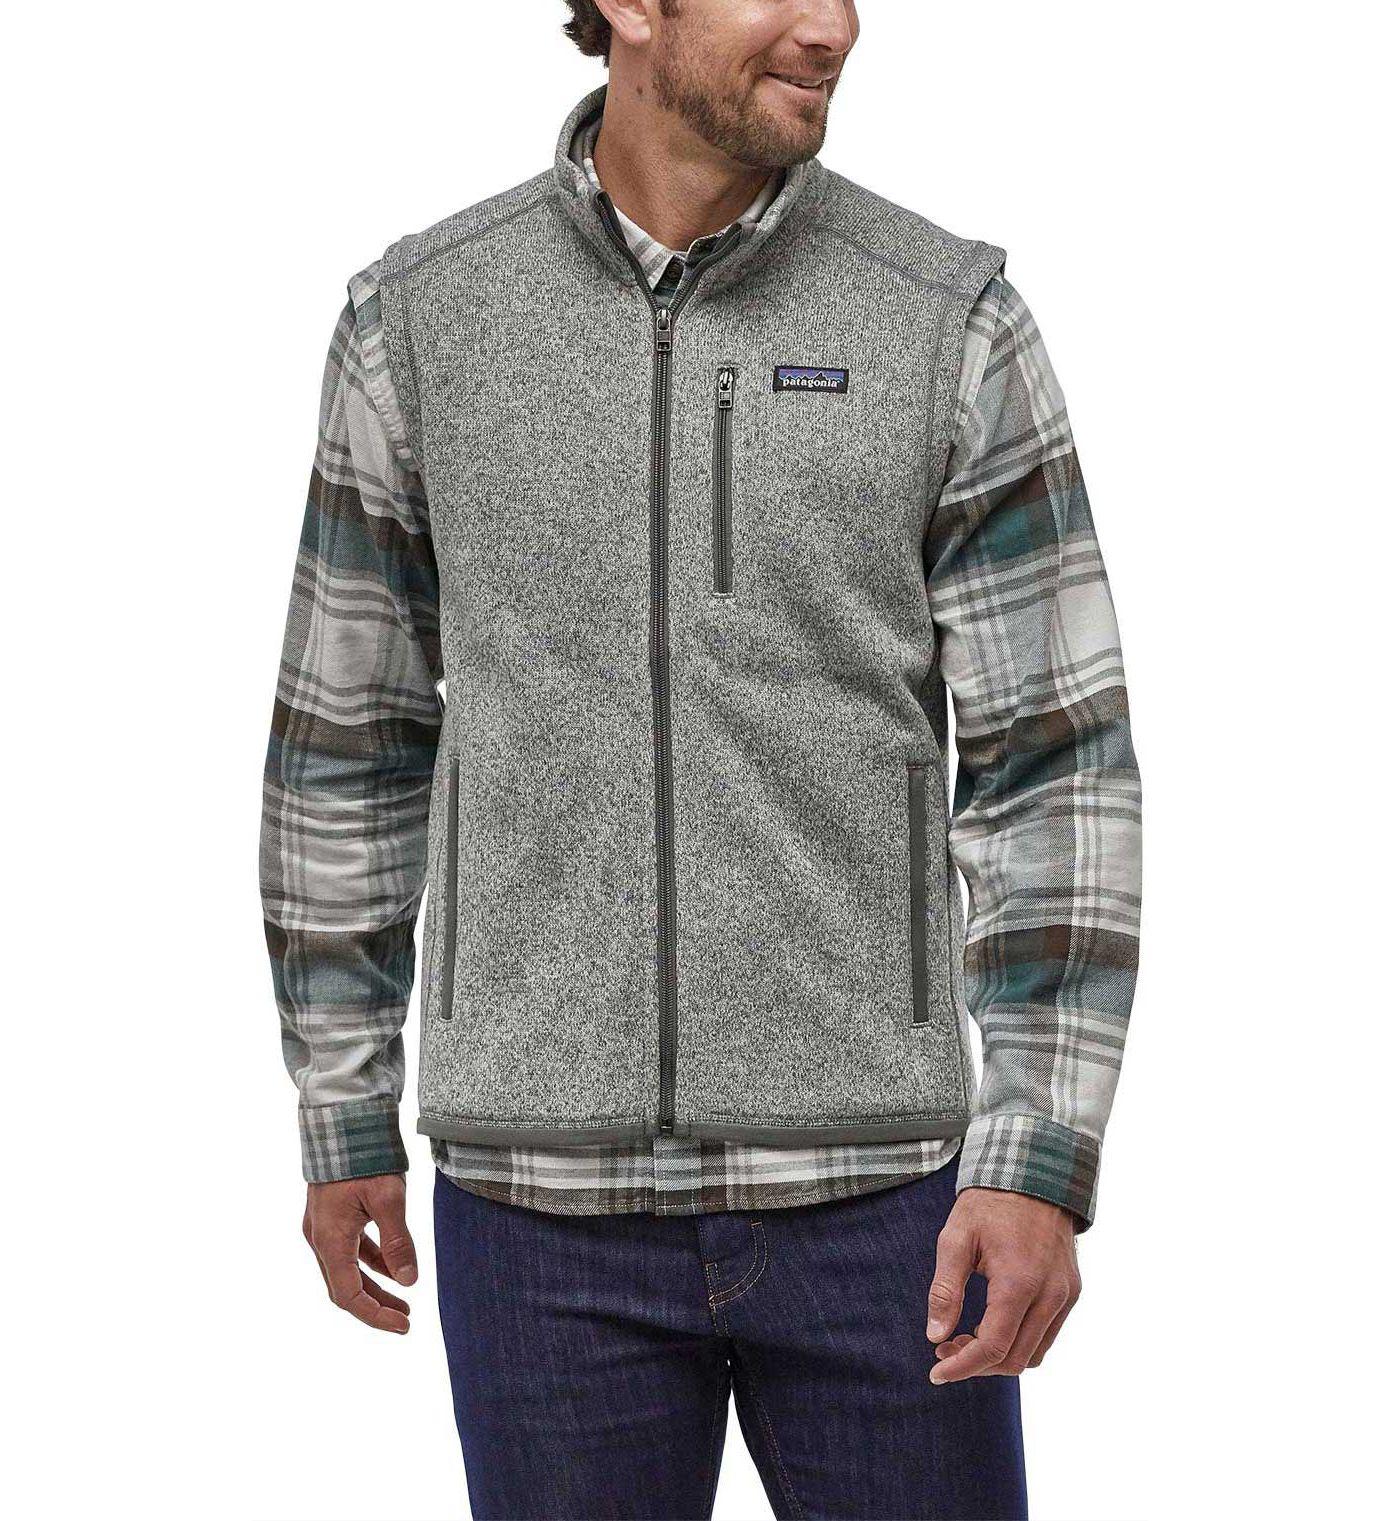 Patagonia Men's Better Sweater Vest 1